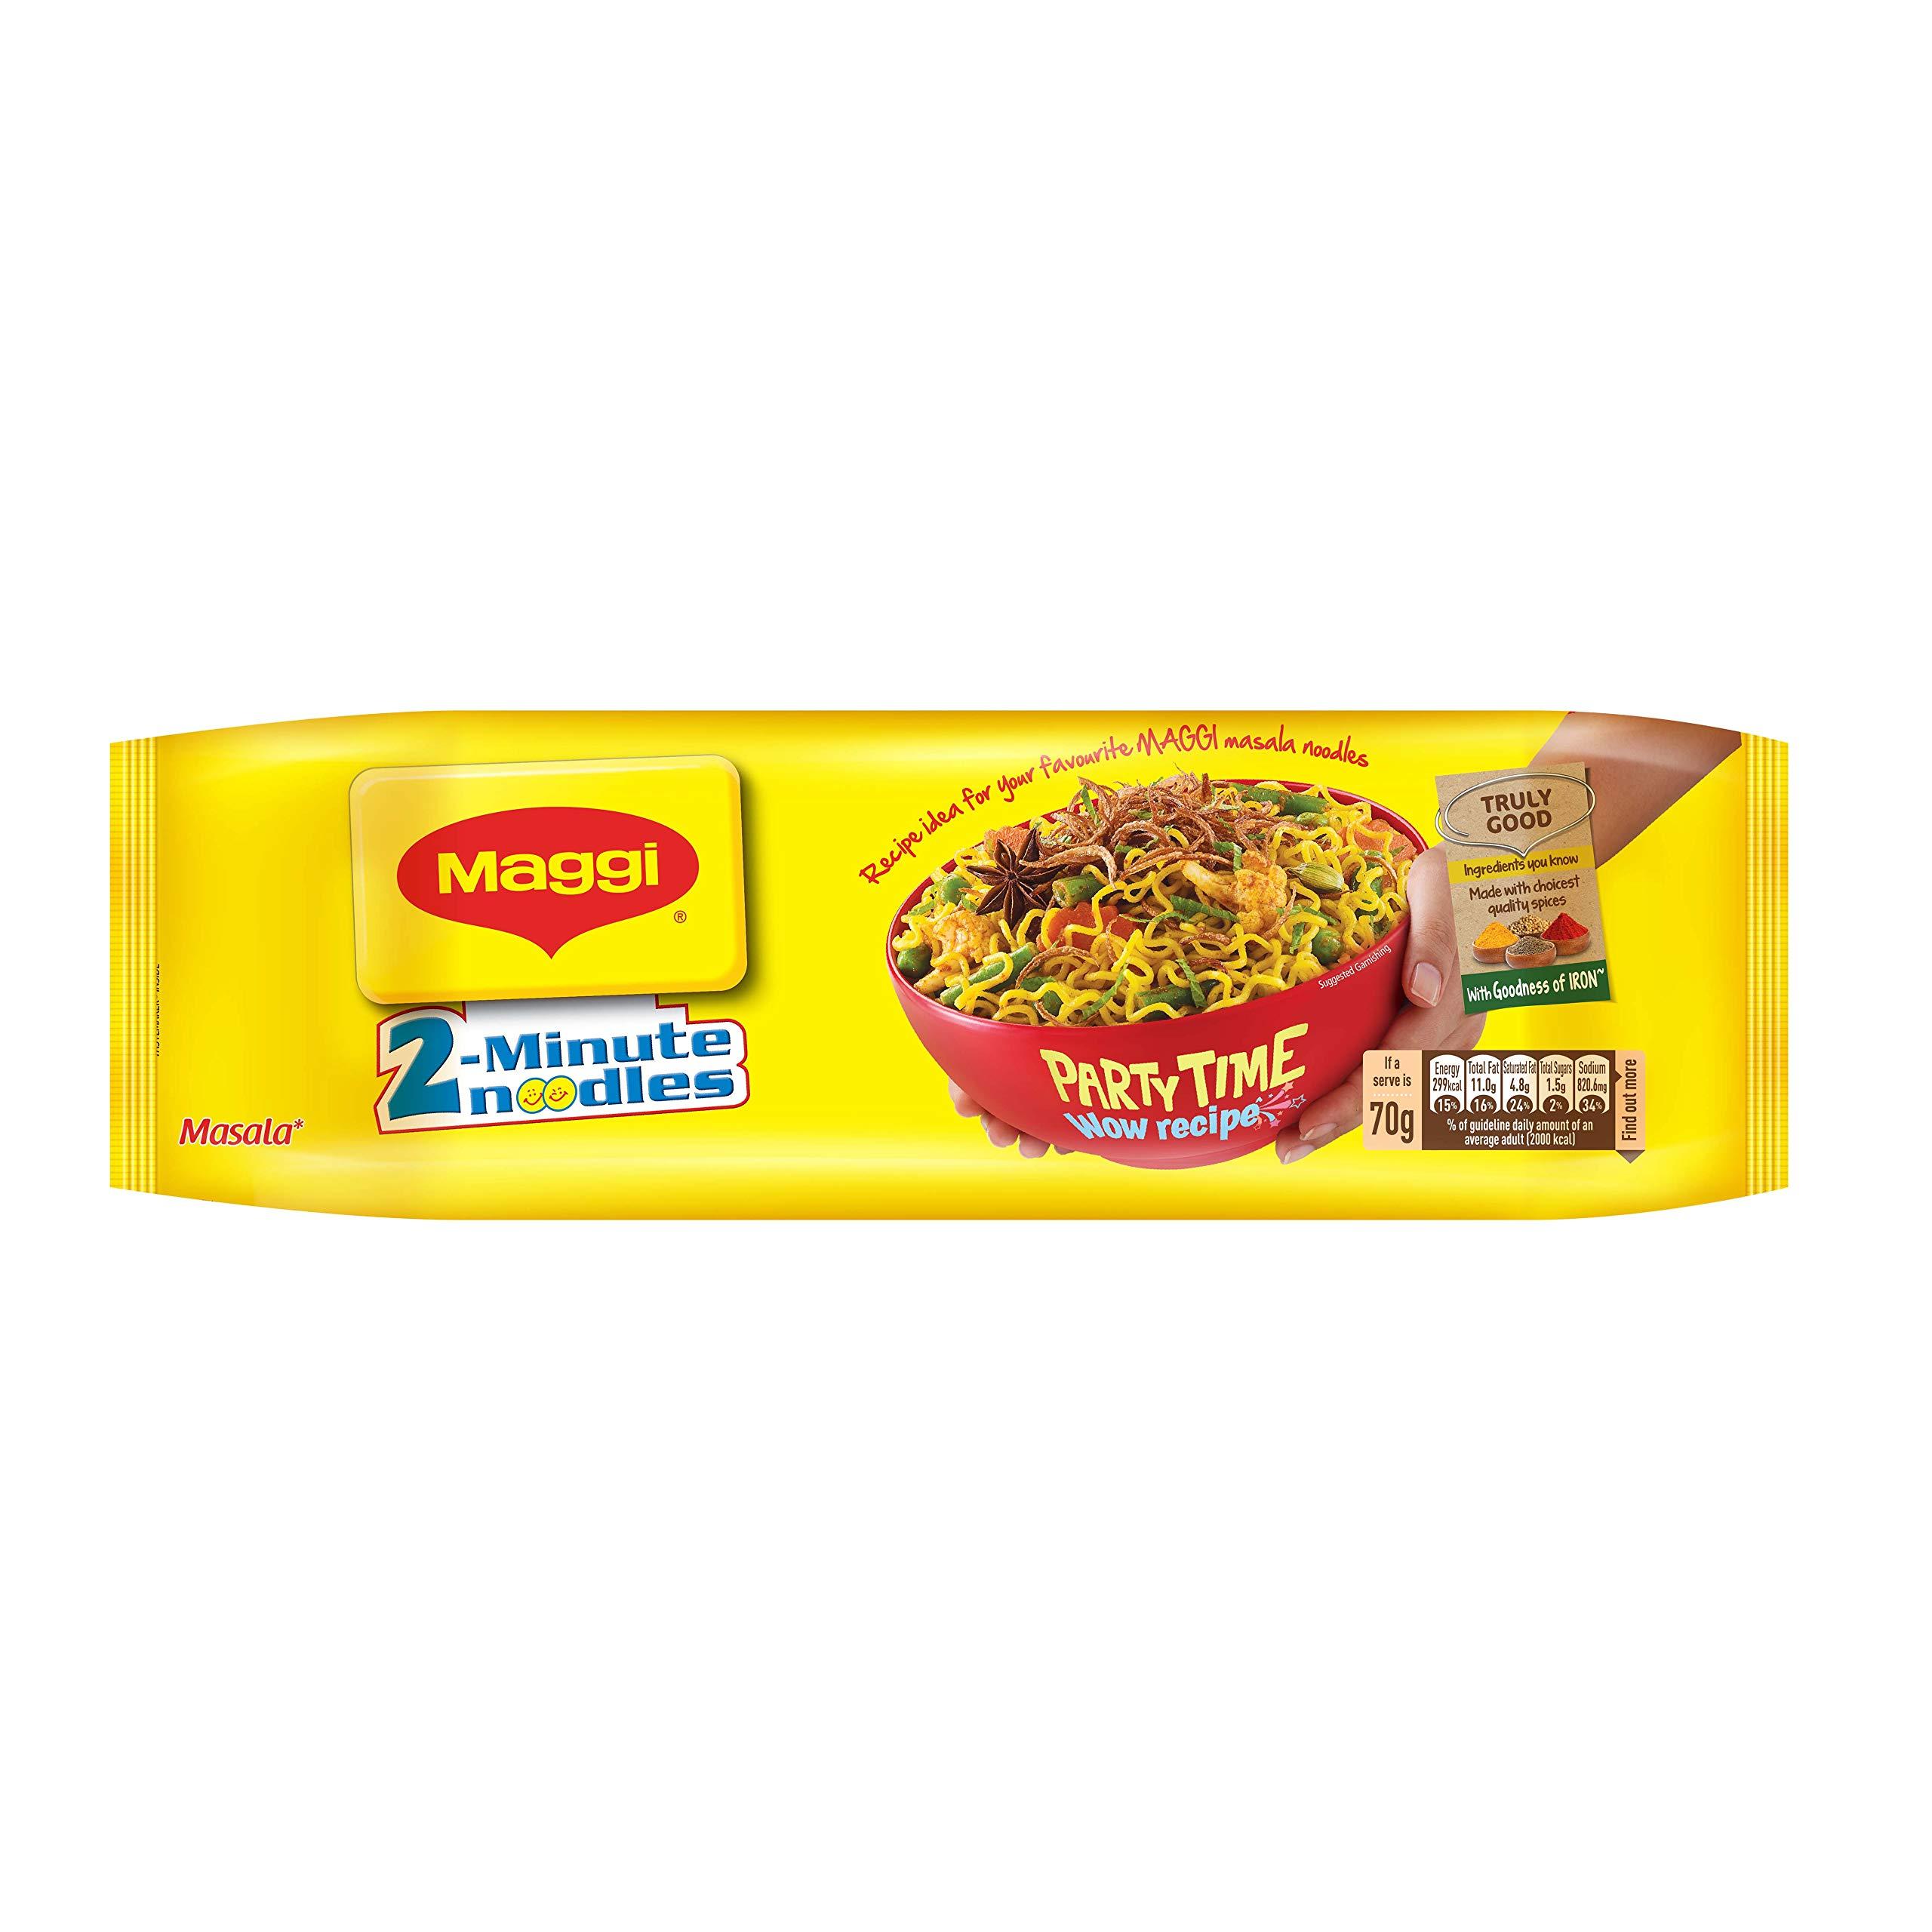 Maggi 2-Minute Instant Noodles - Masala, 560 gm